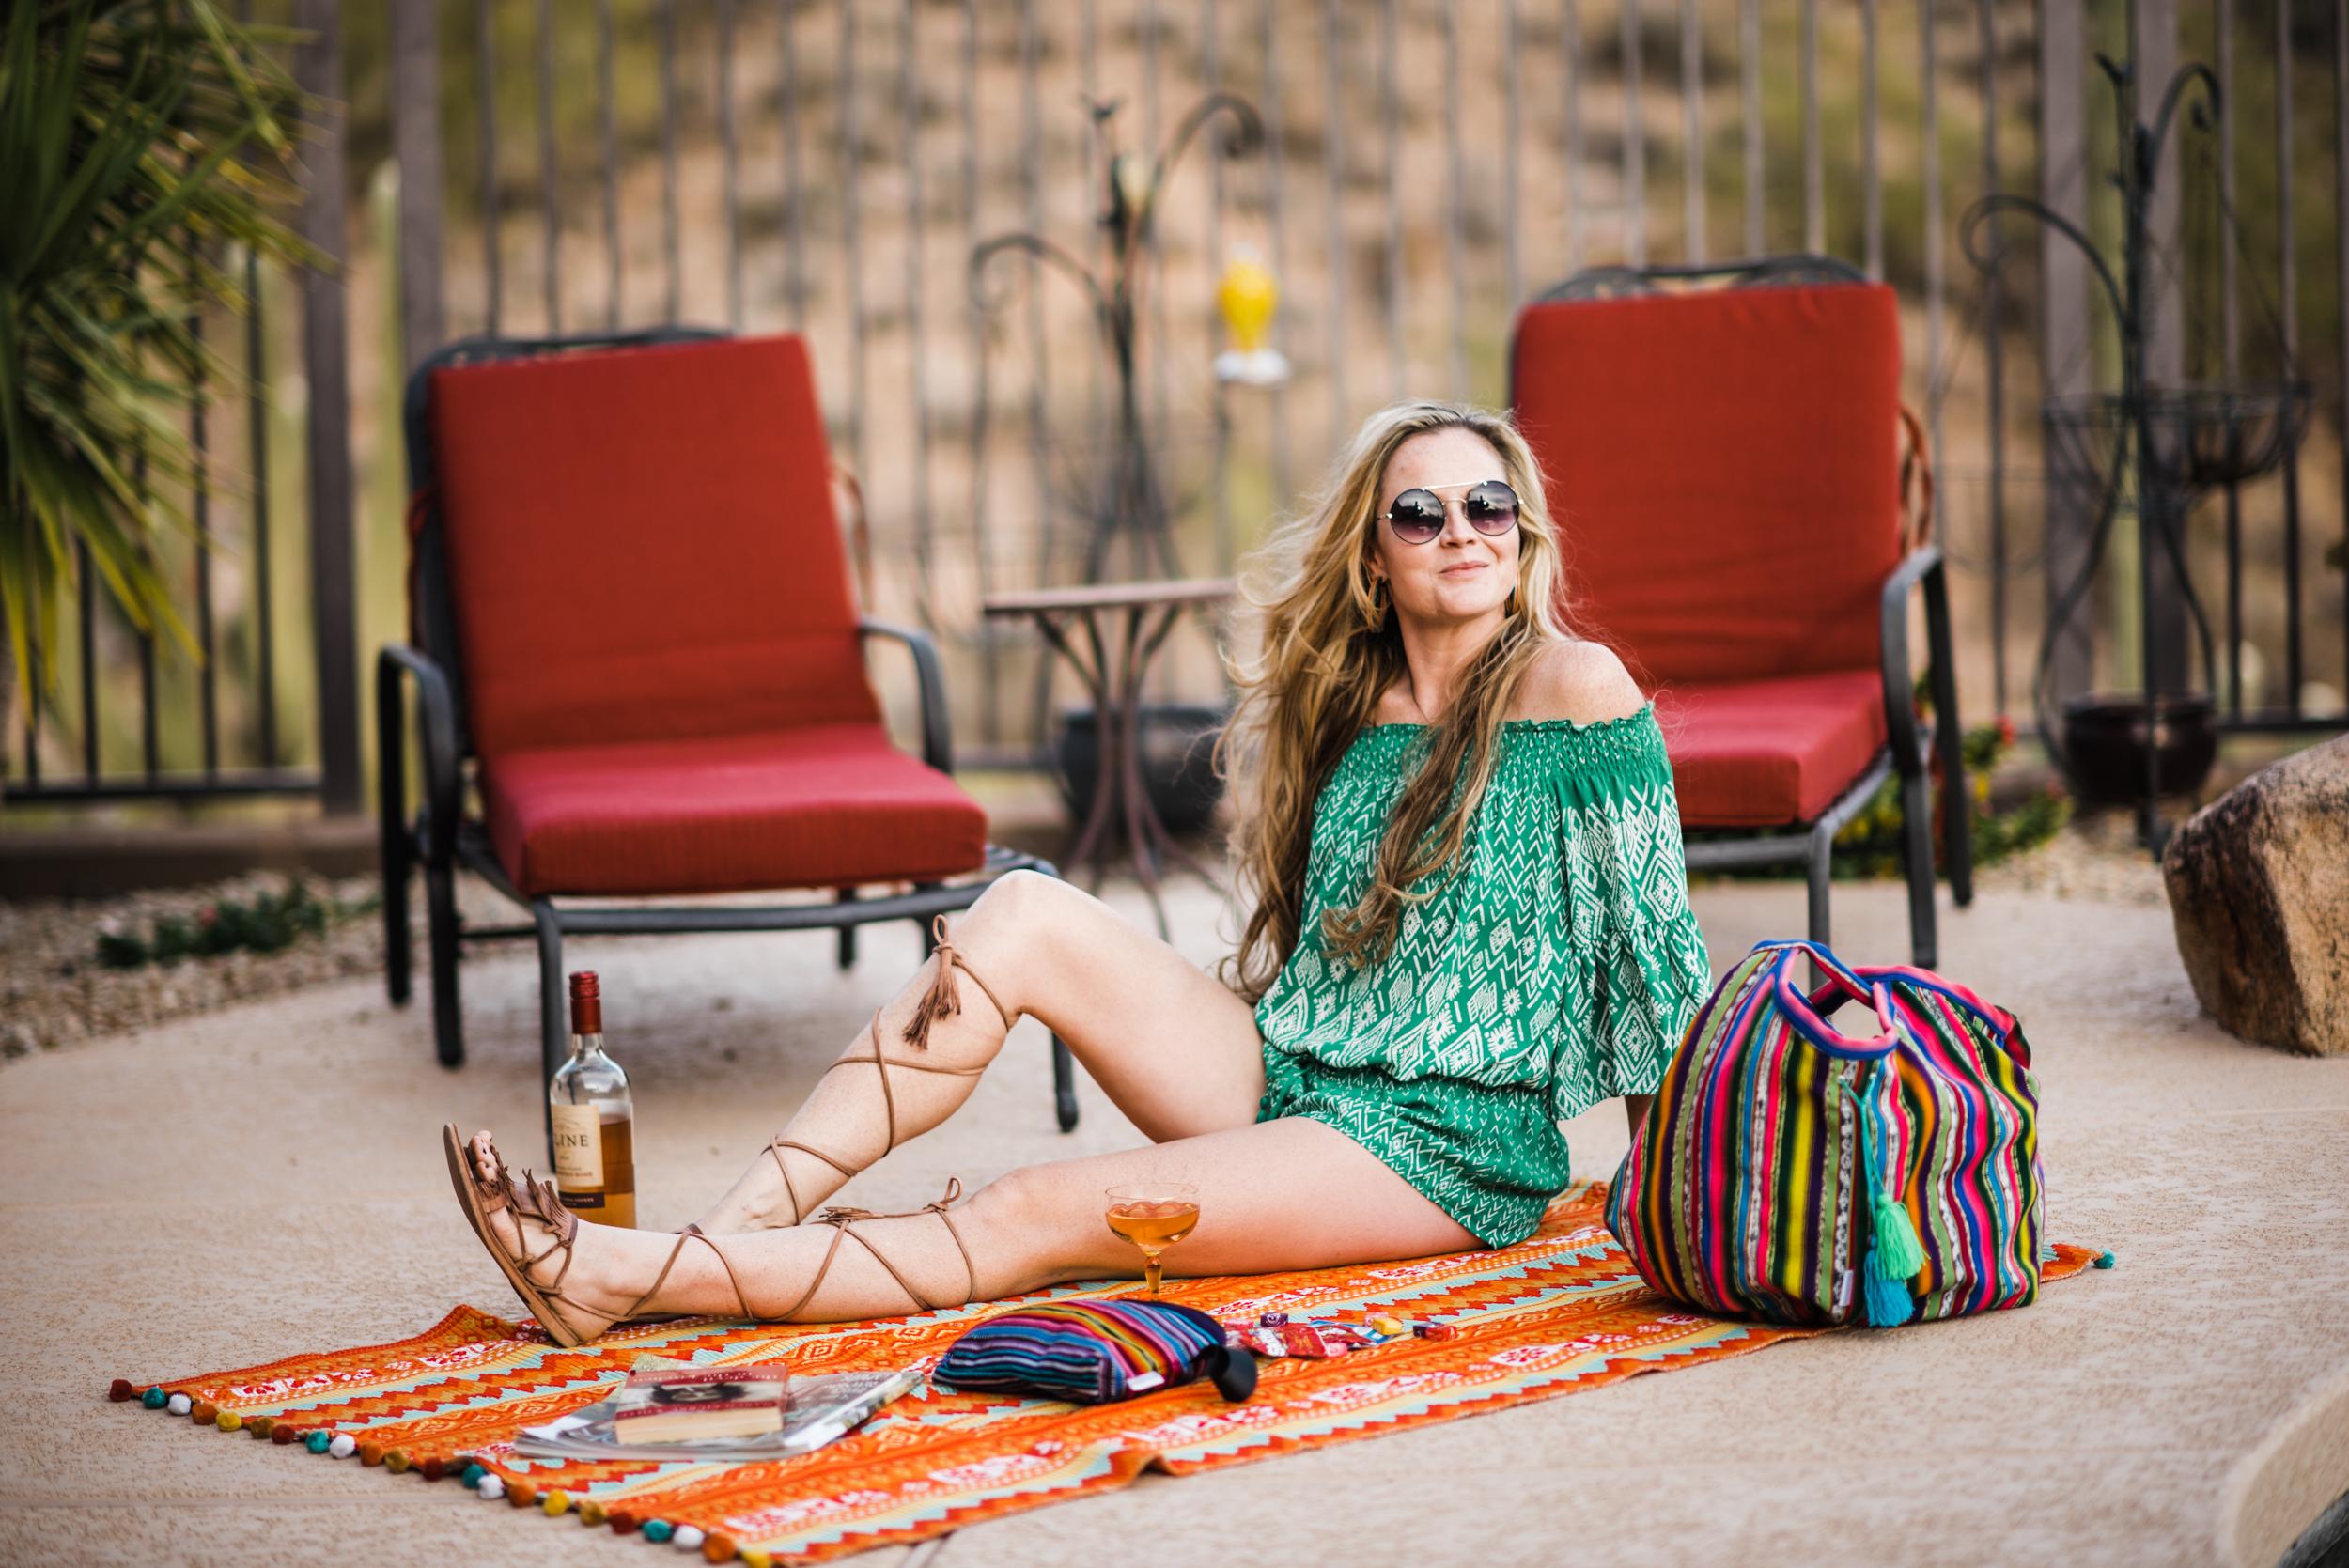 Arizona-love-hippie-momma-bags-boho.jpg